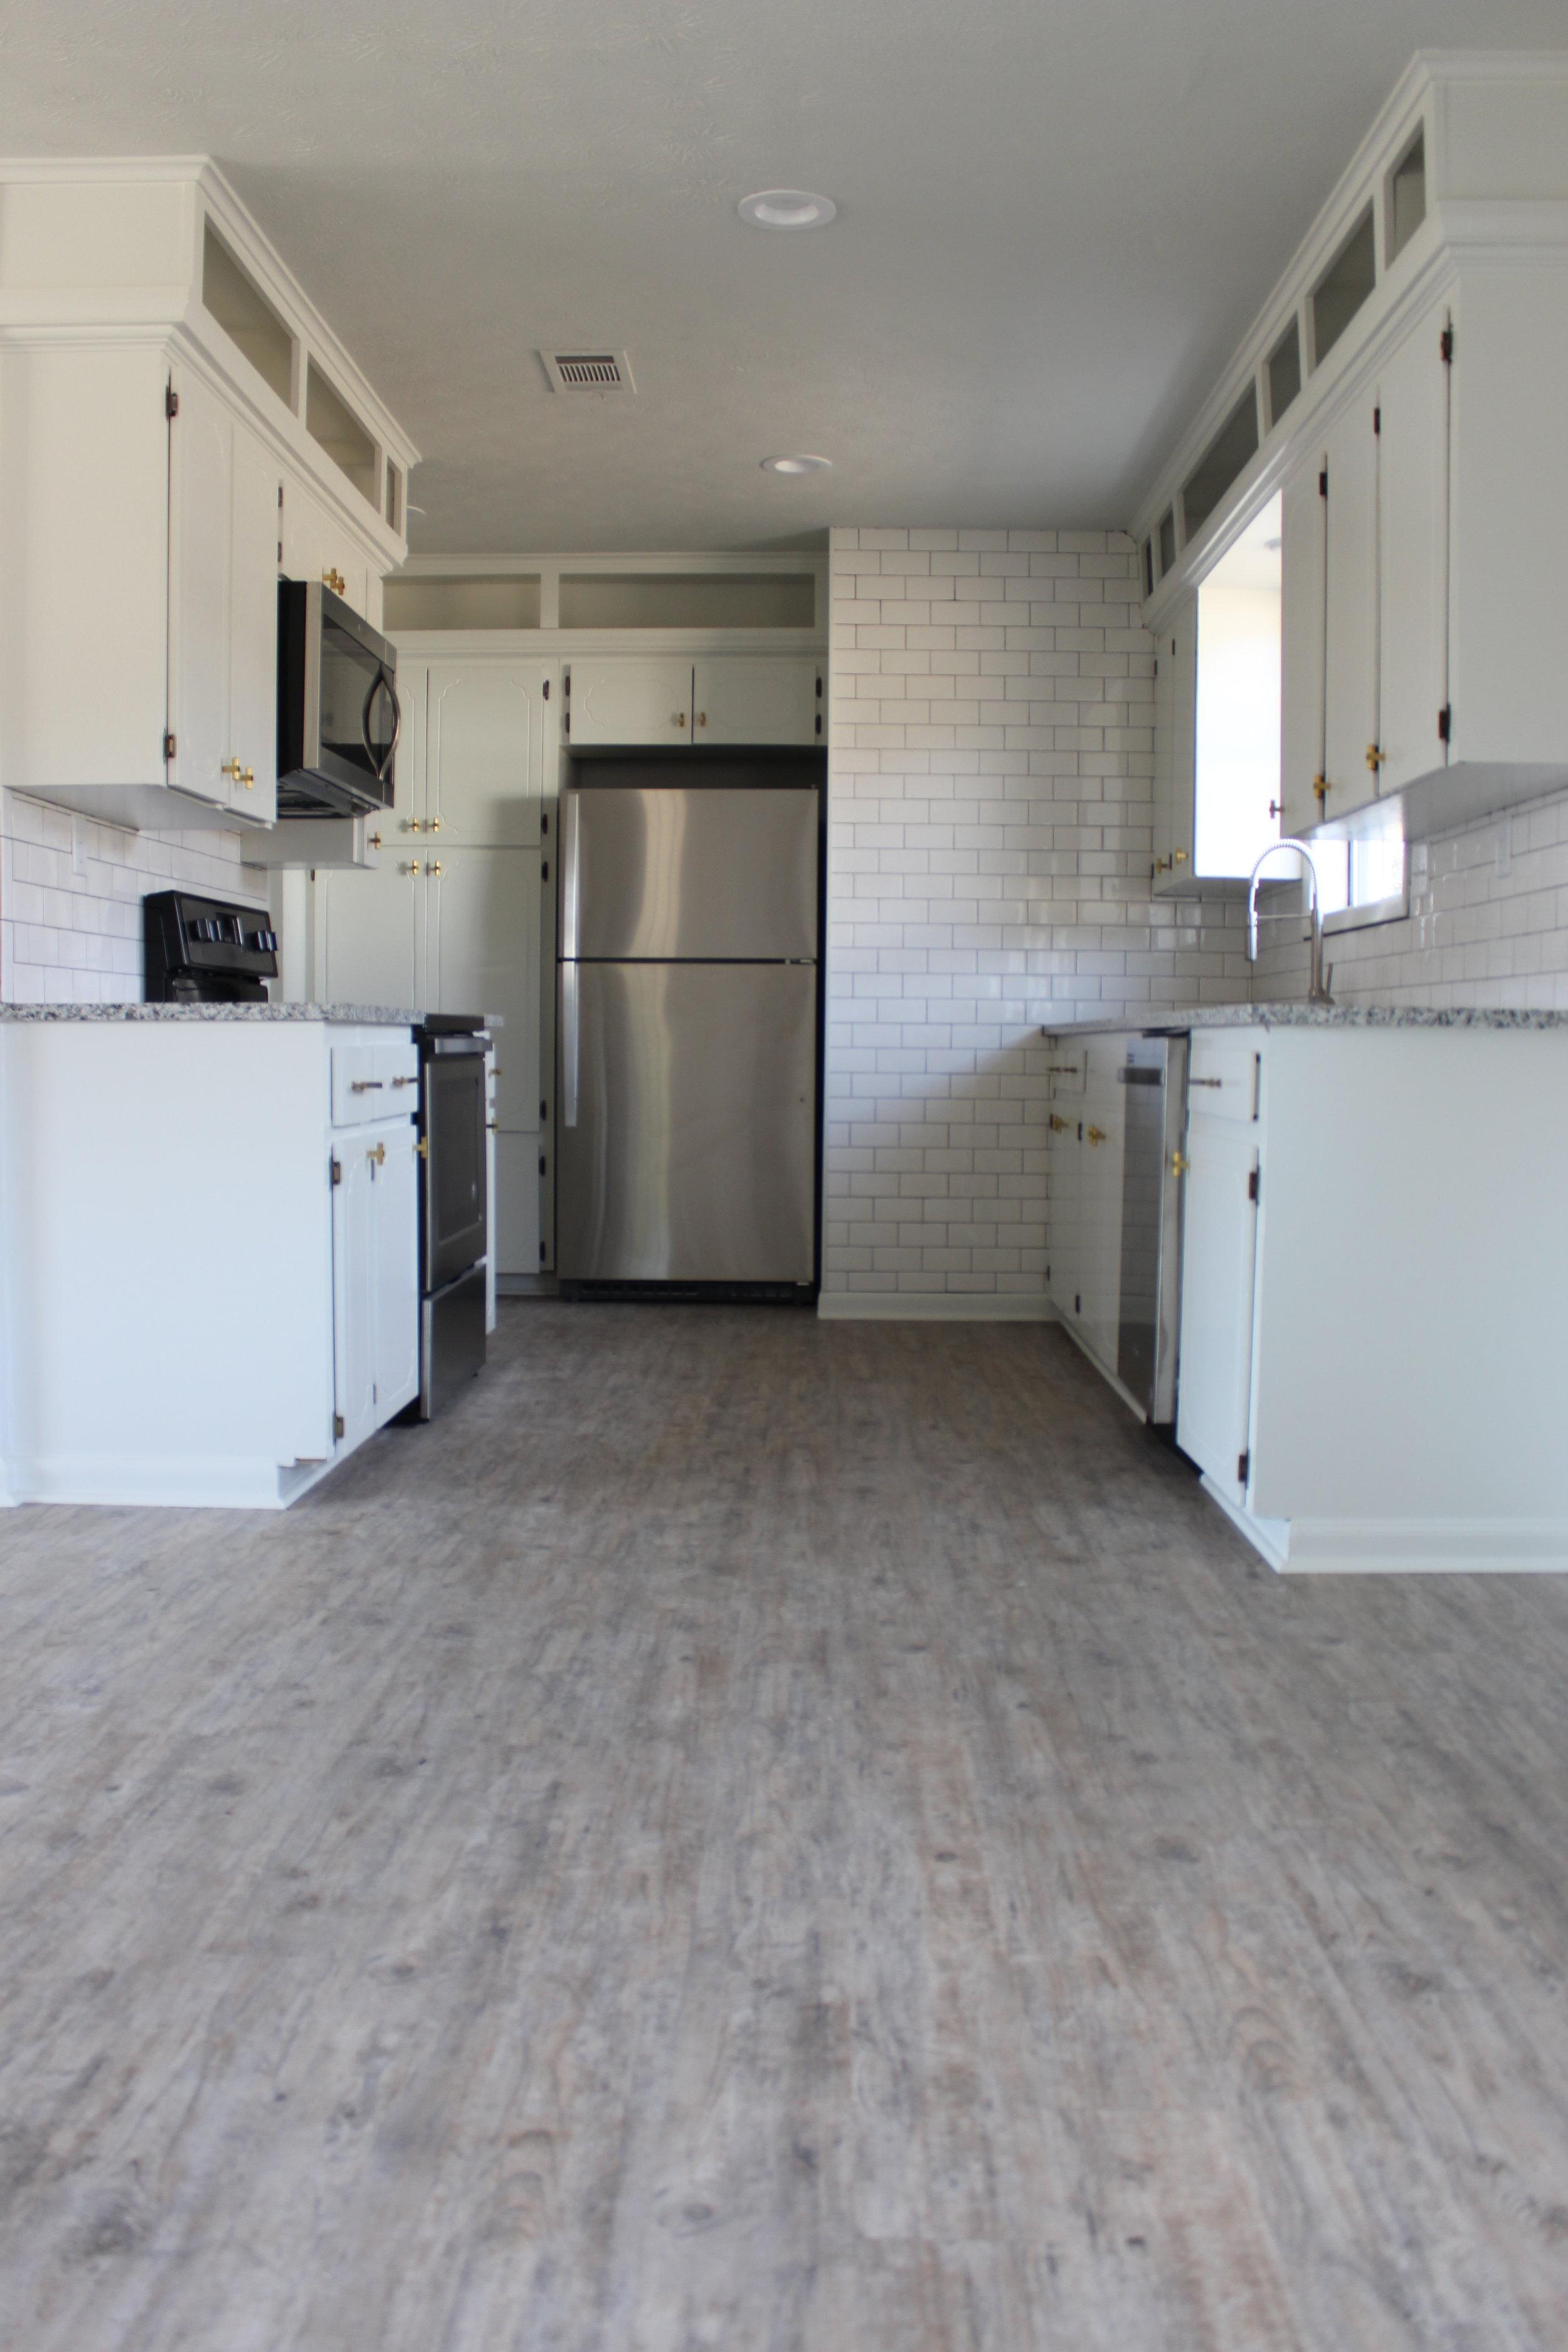 zimmerman_home_flip_house_after_southern_arkansas_kitchen.JPG